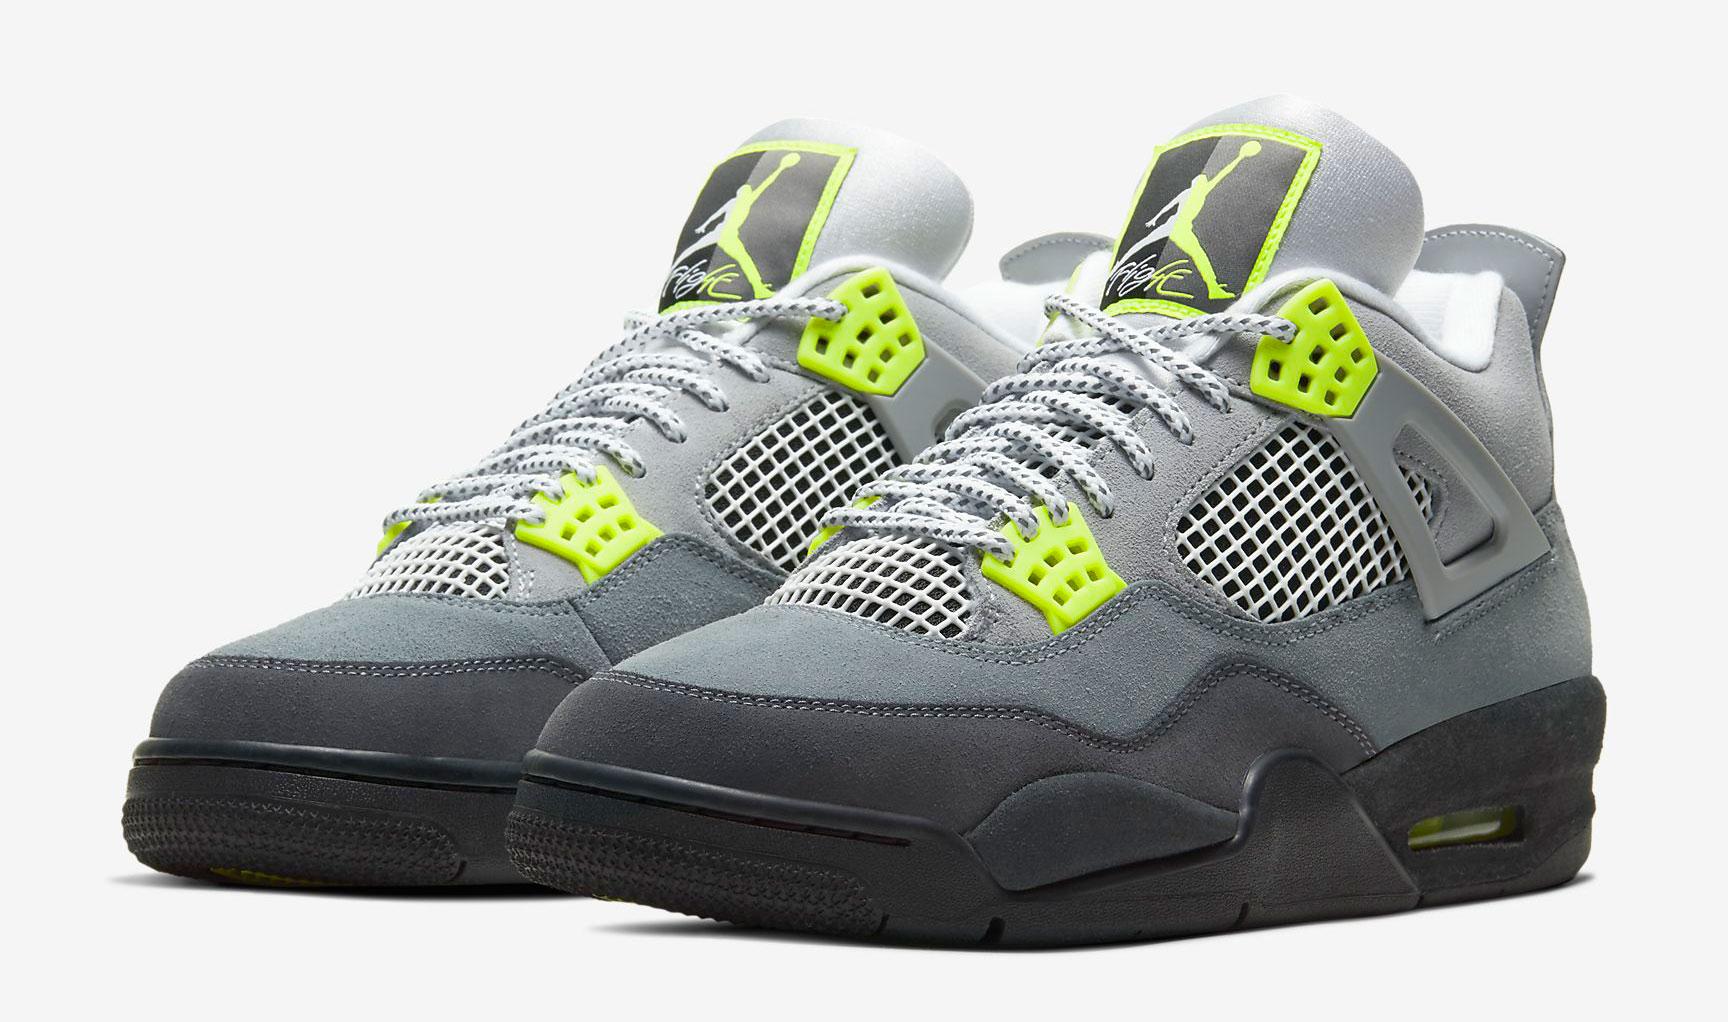 air-jordan-4-neon-outfits-clothing-match